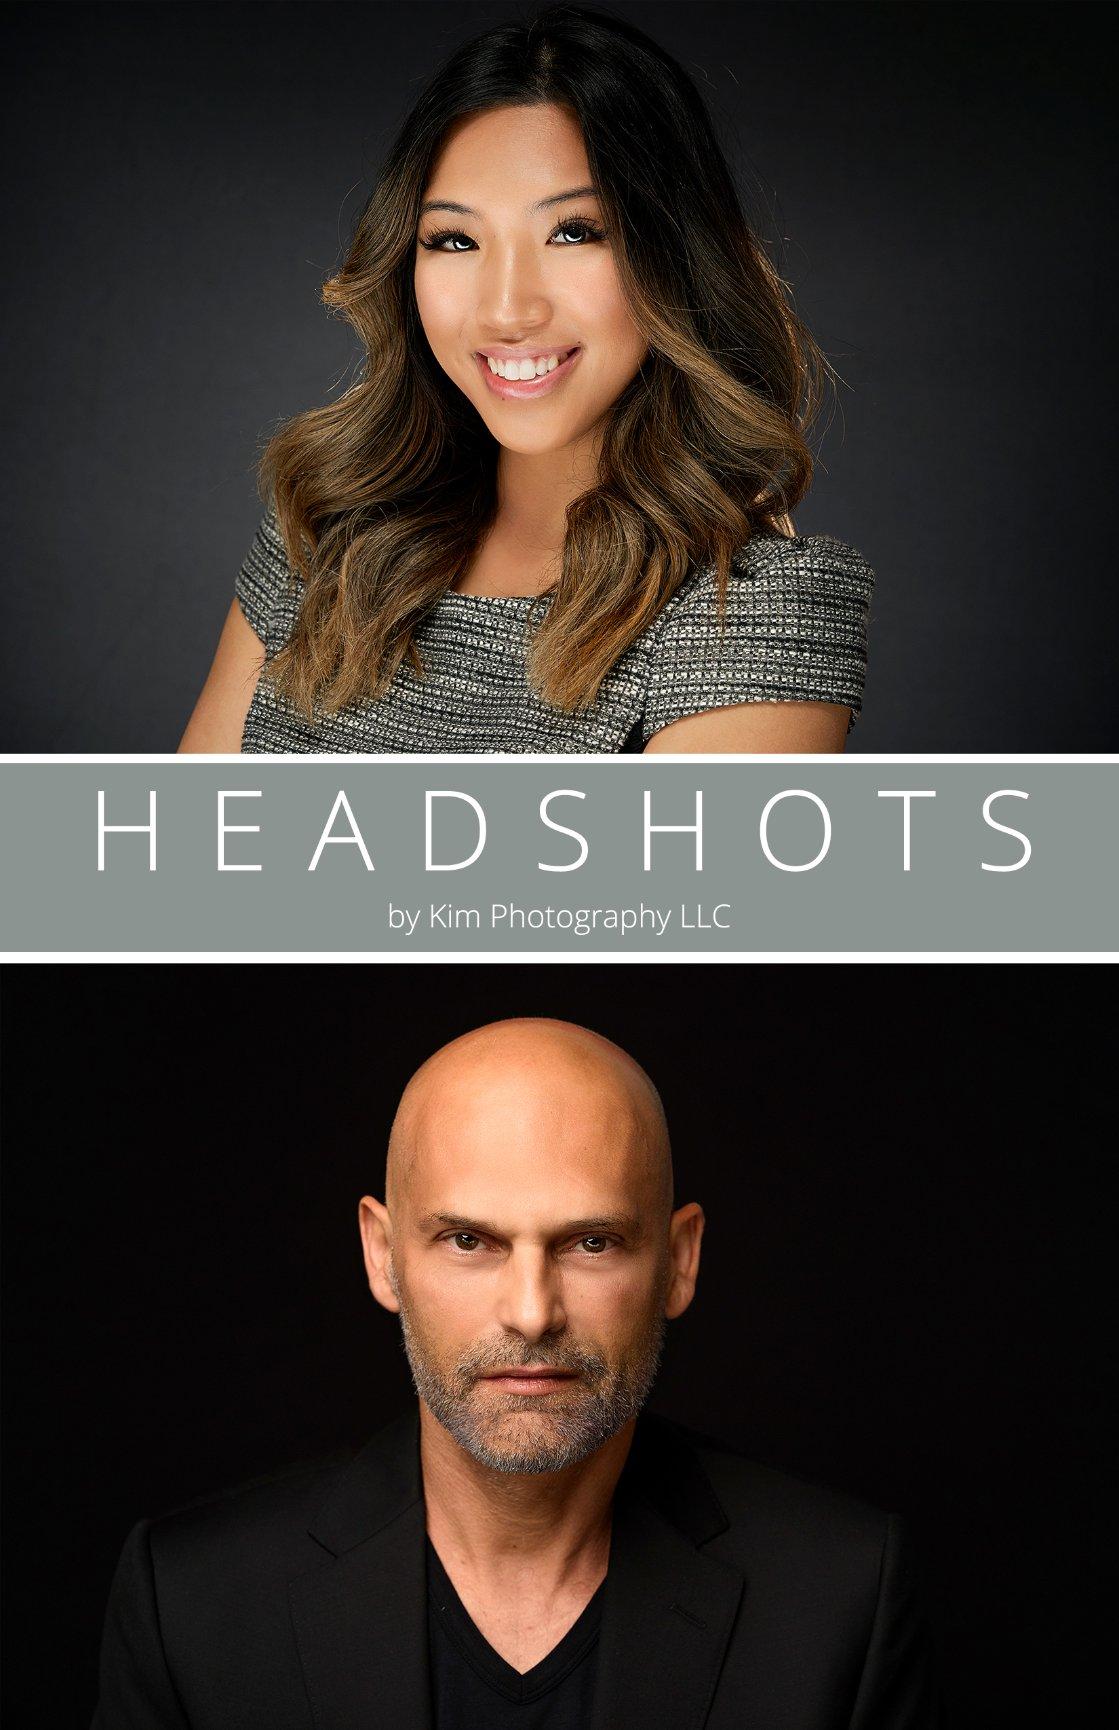 HEADSHOTS - Las Vegas Headshot Photographer